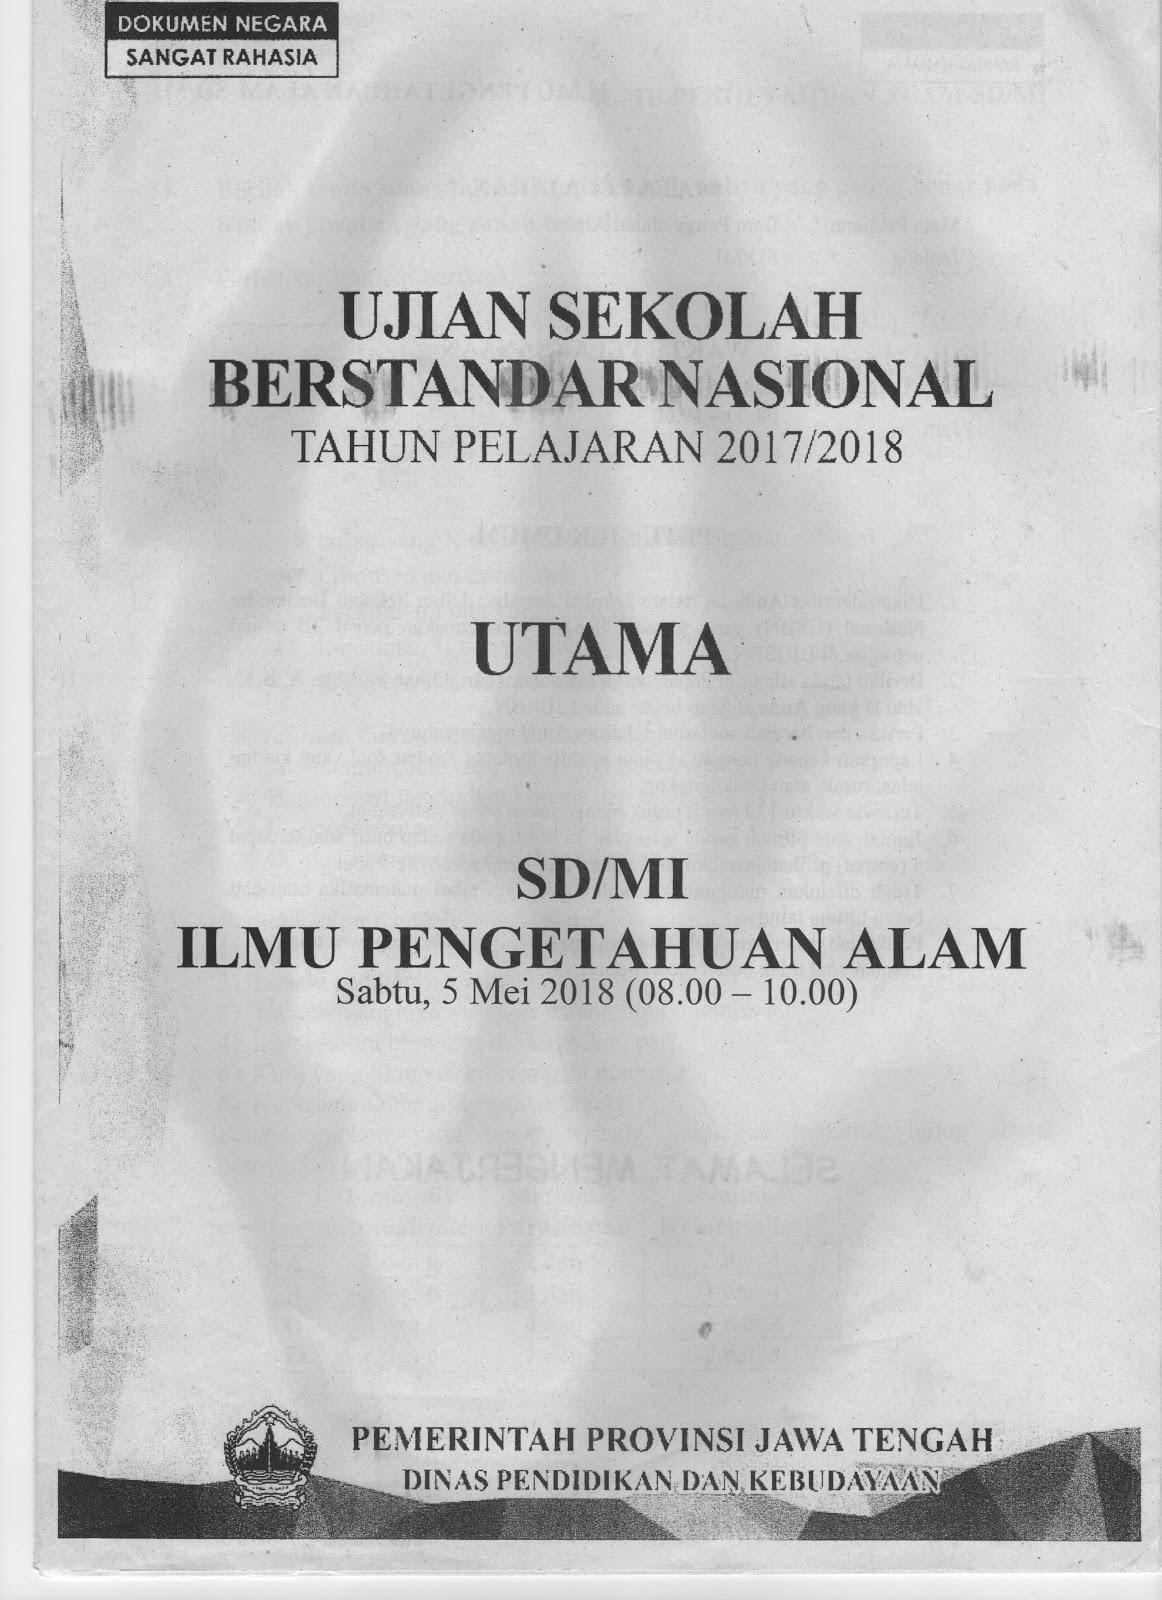 SOAL USBN IPA TAHUN PELAJARAN 2017/2018